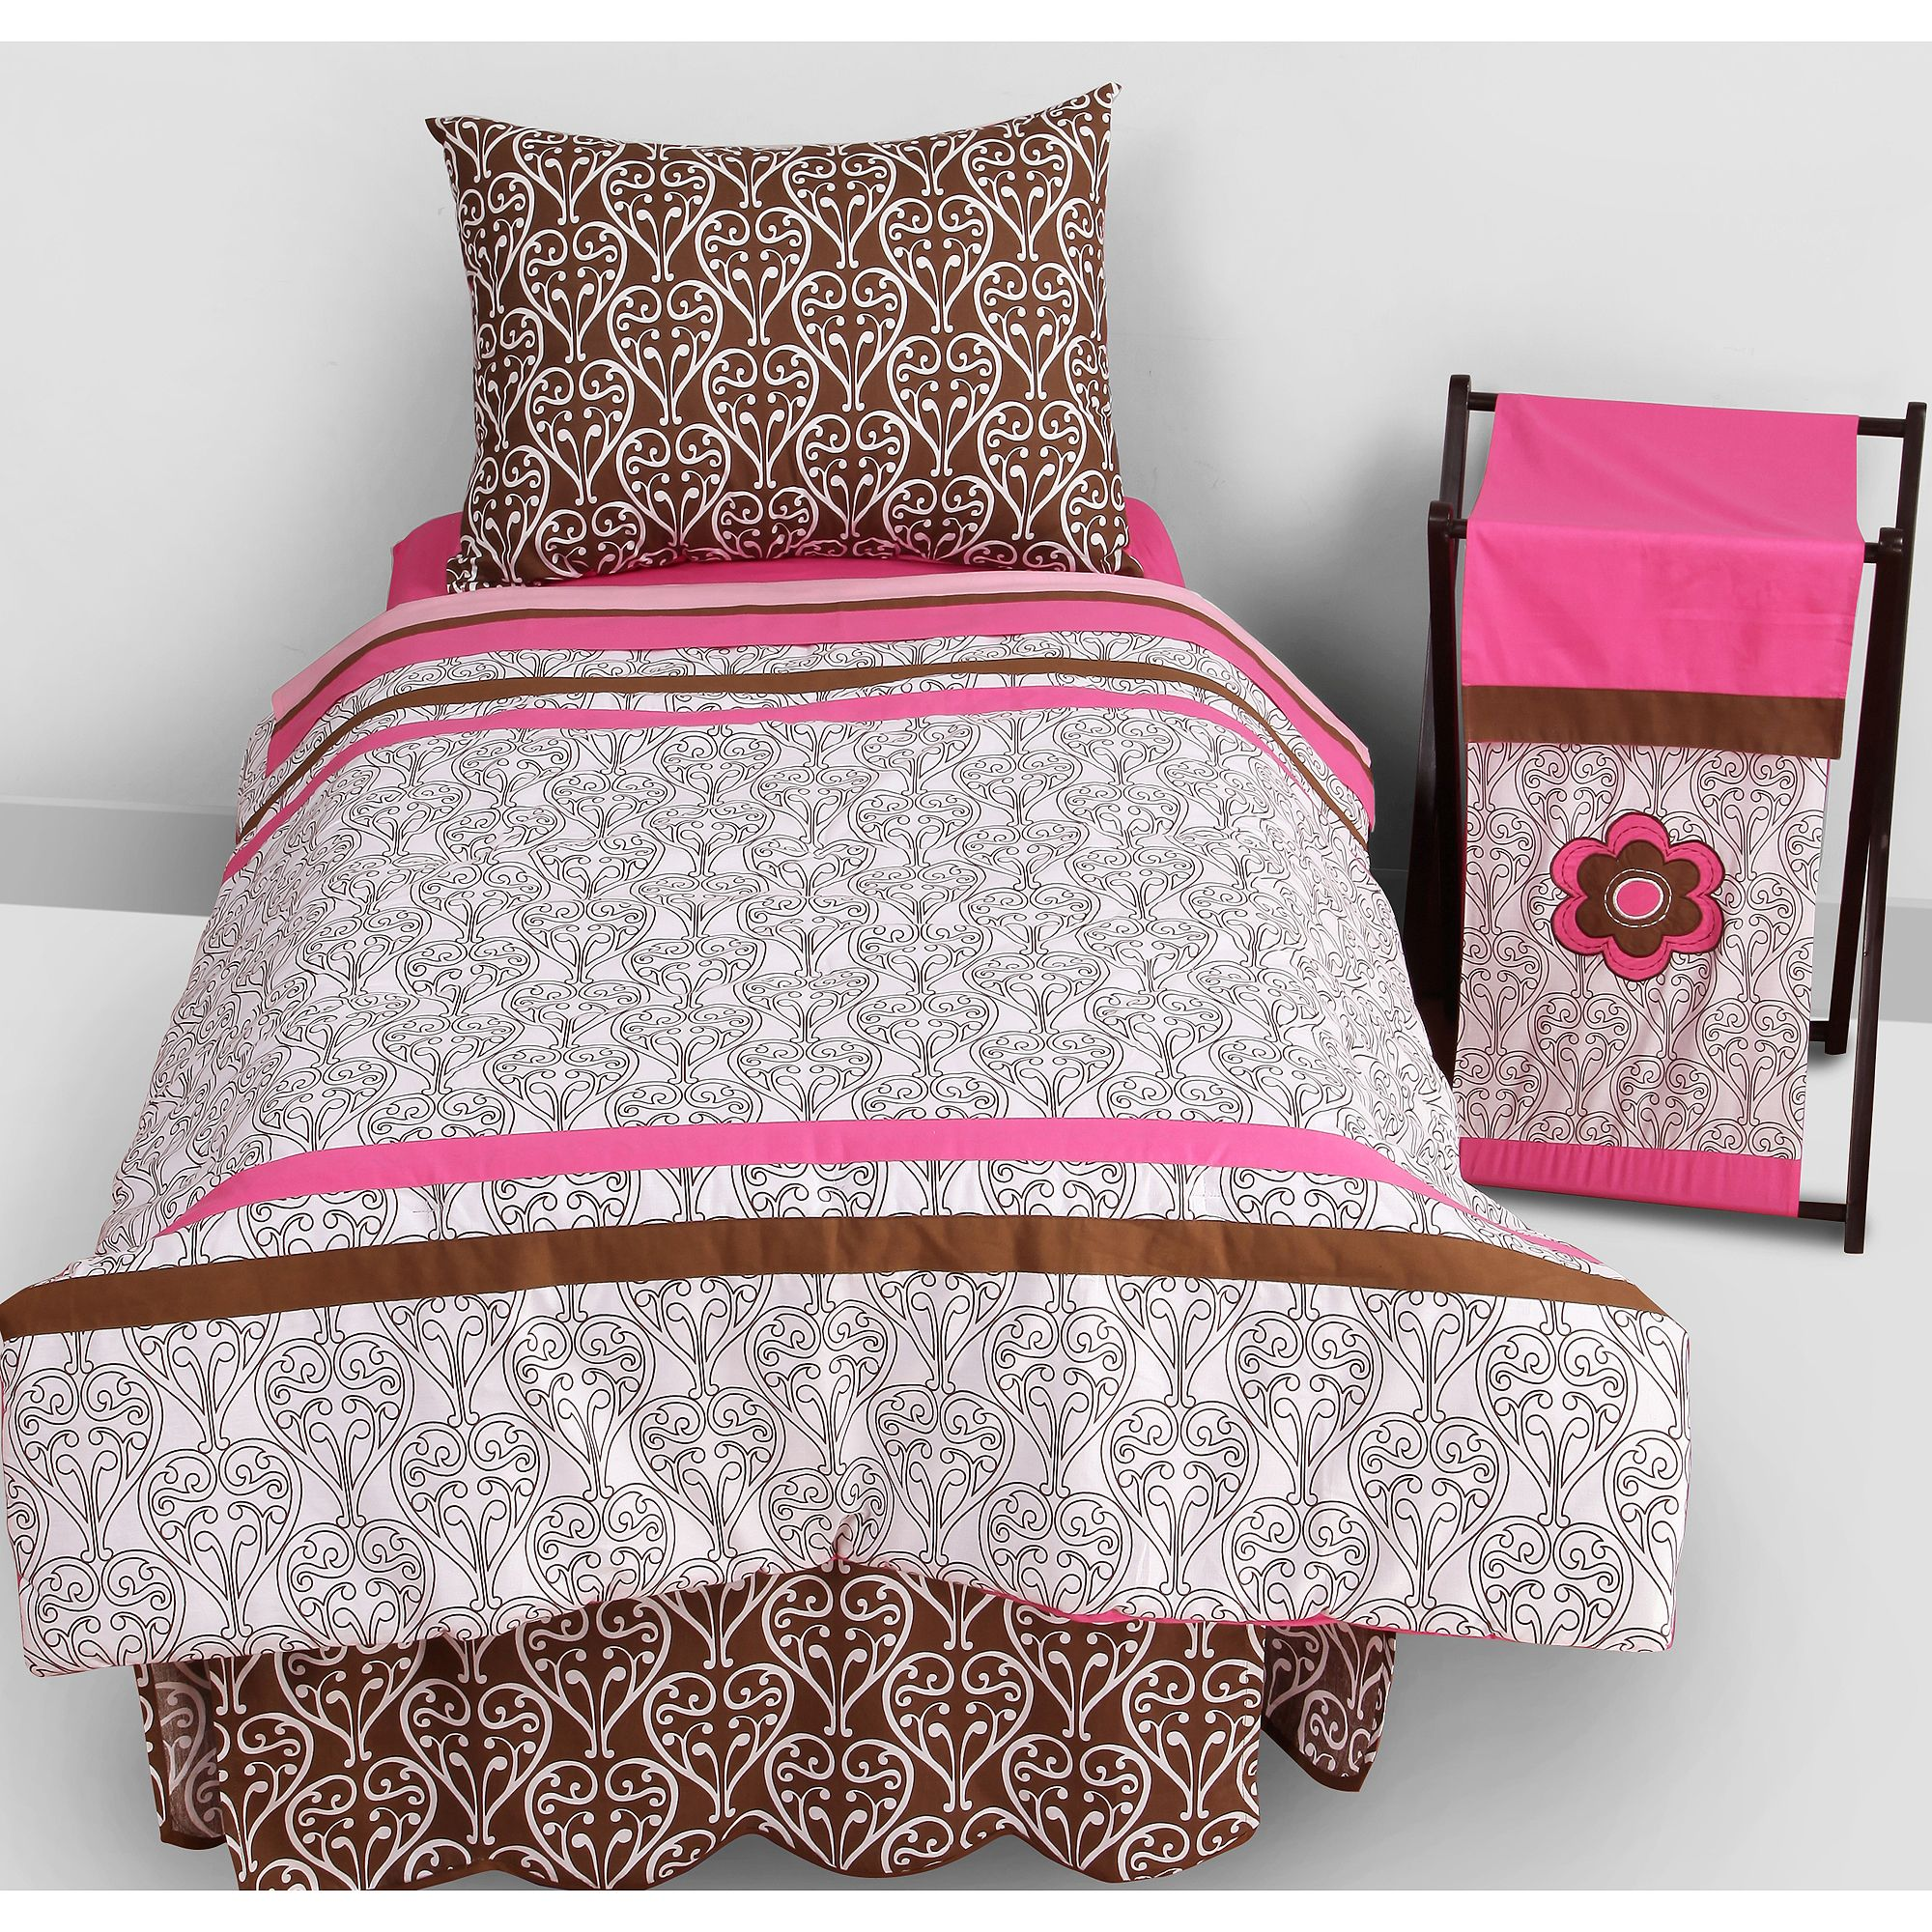 Bacati Damask 4pc Toddler Bedding set 100% Cotton percale,  Pk/Chocolate